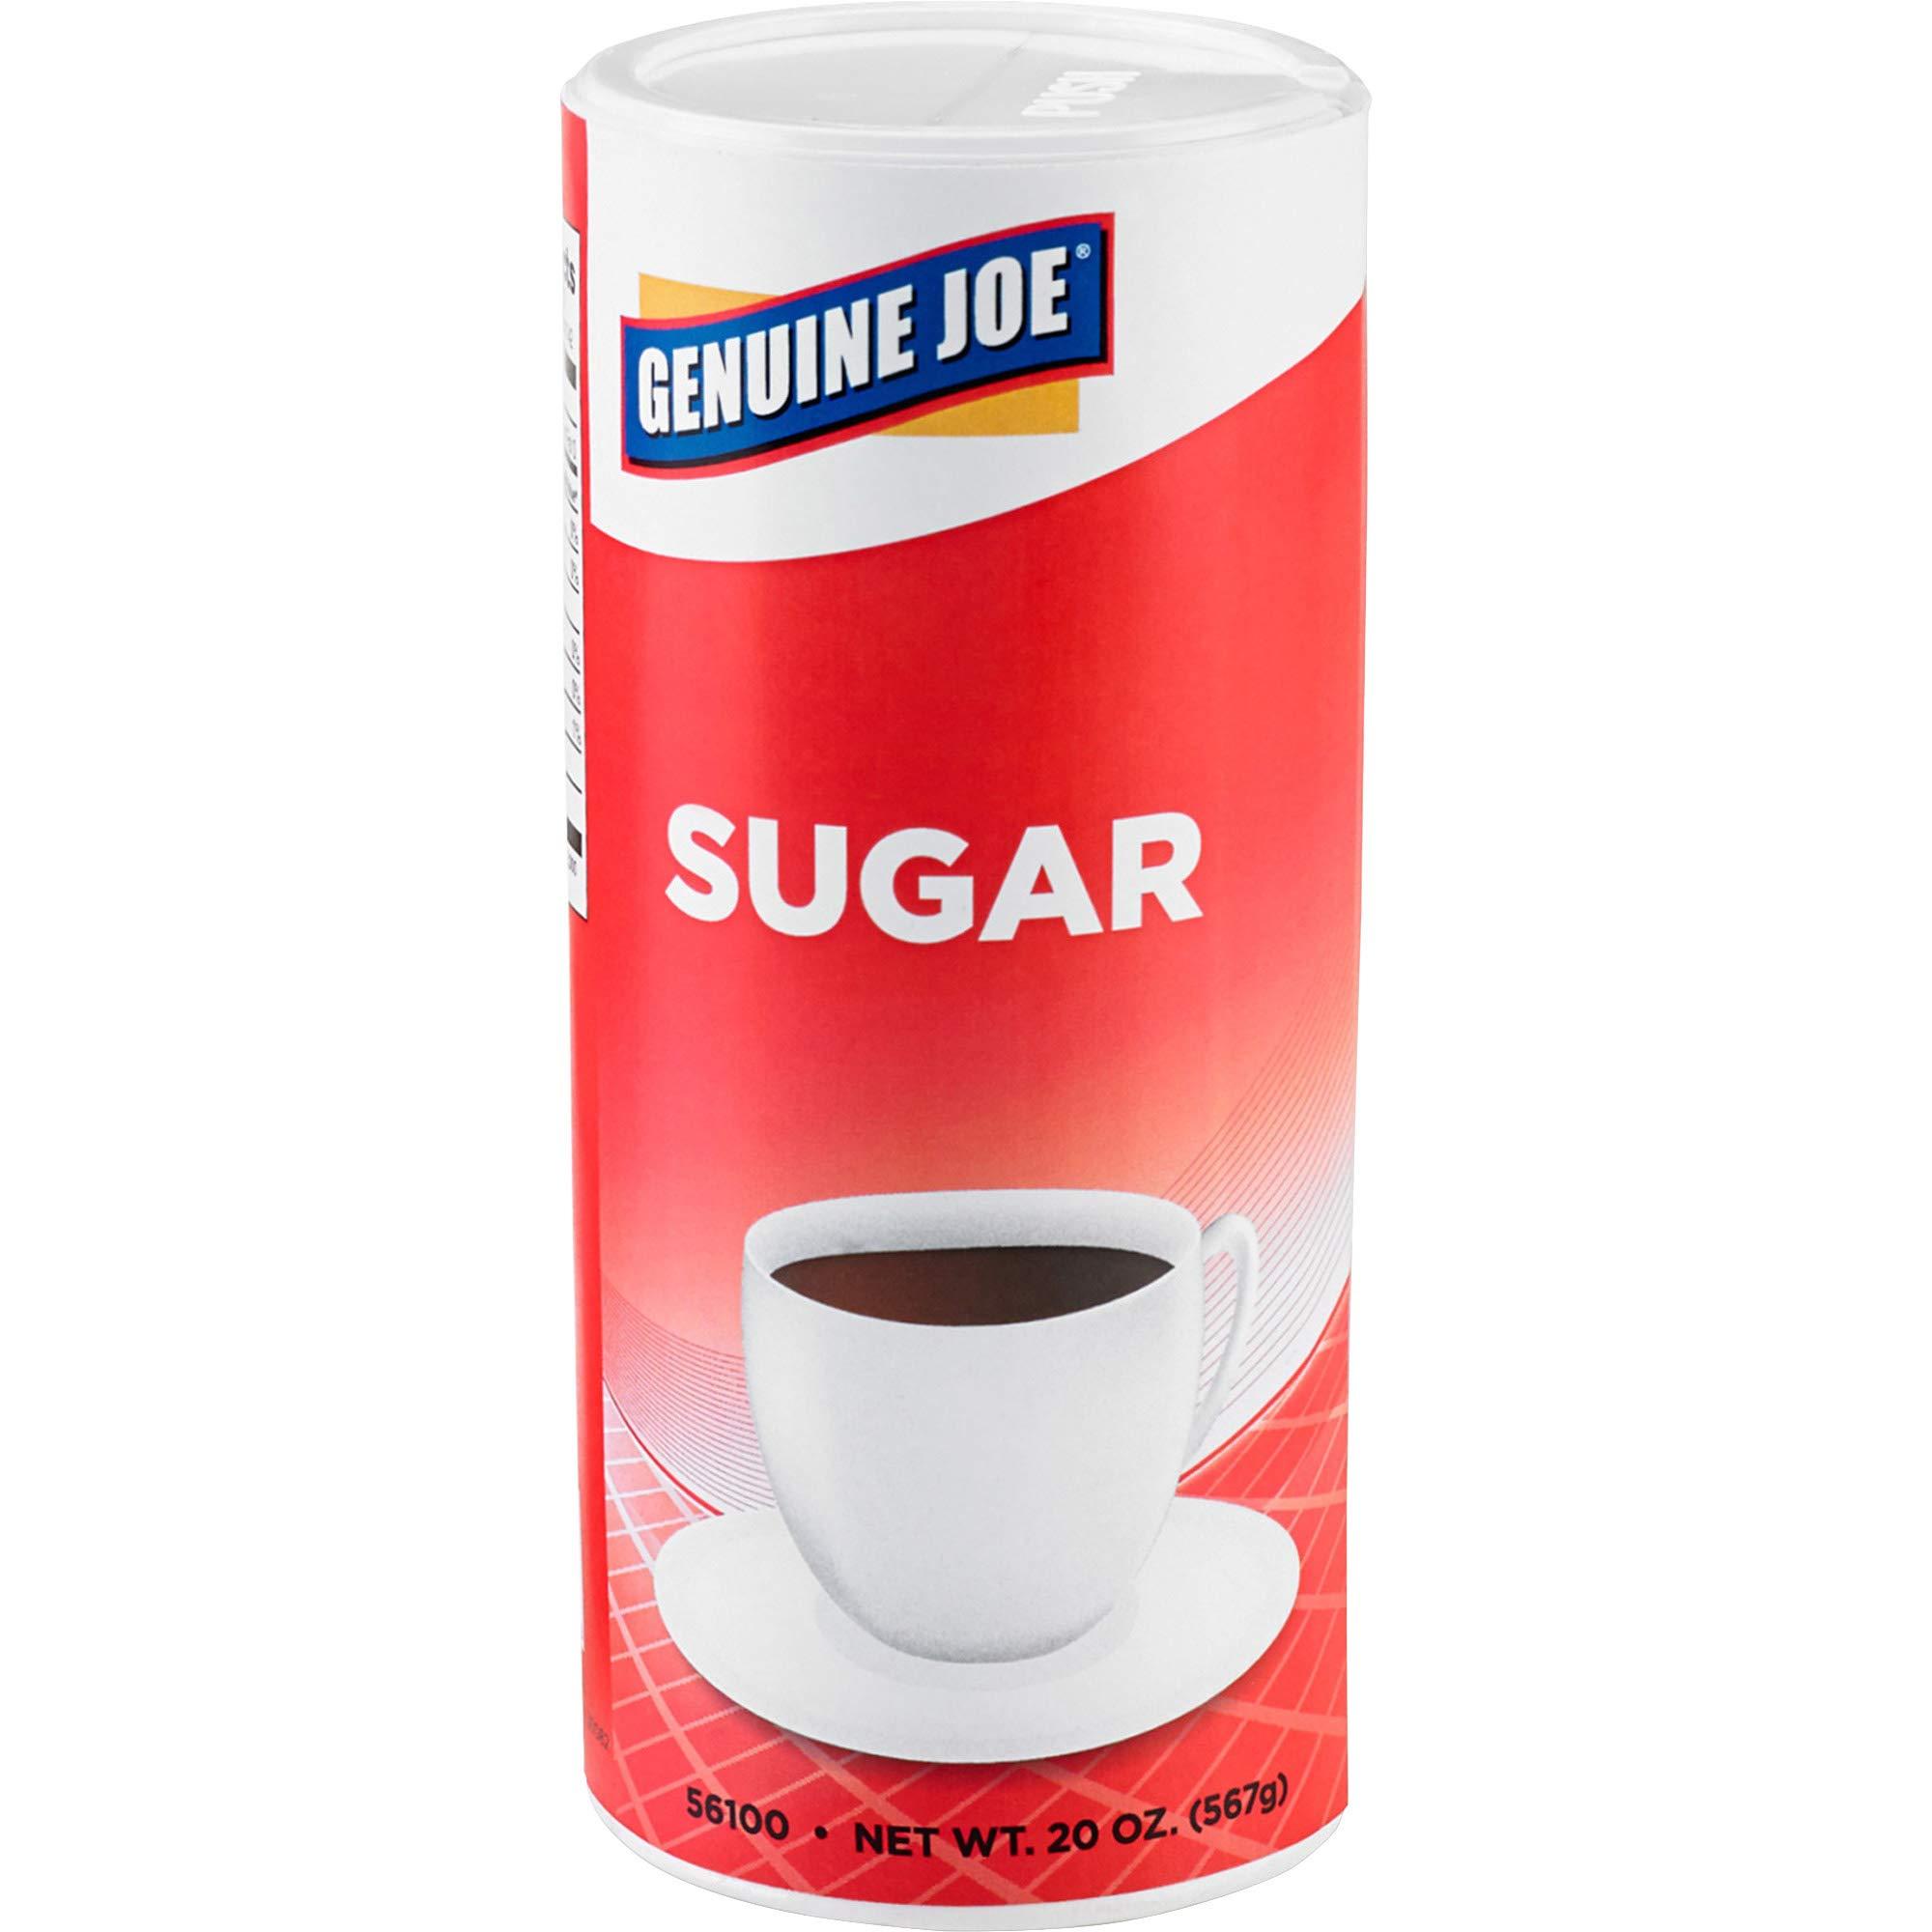 Genuine Joe 20 oz. Sugar Canister , Pack of 3